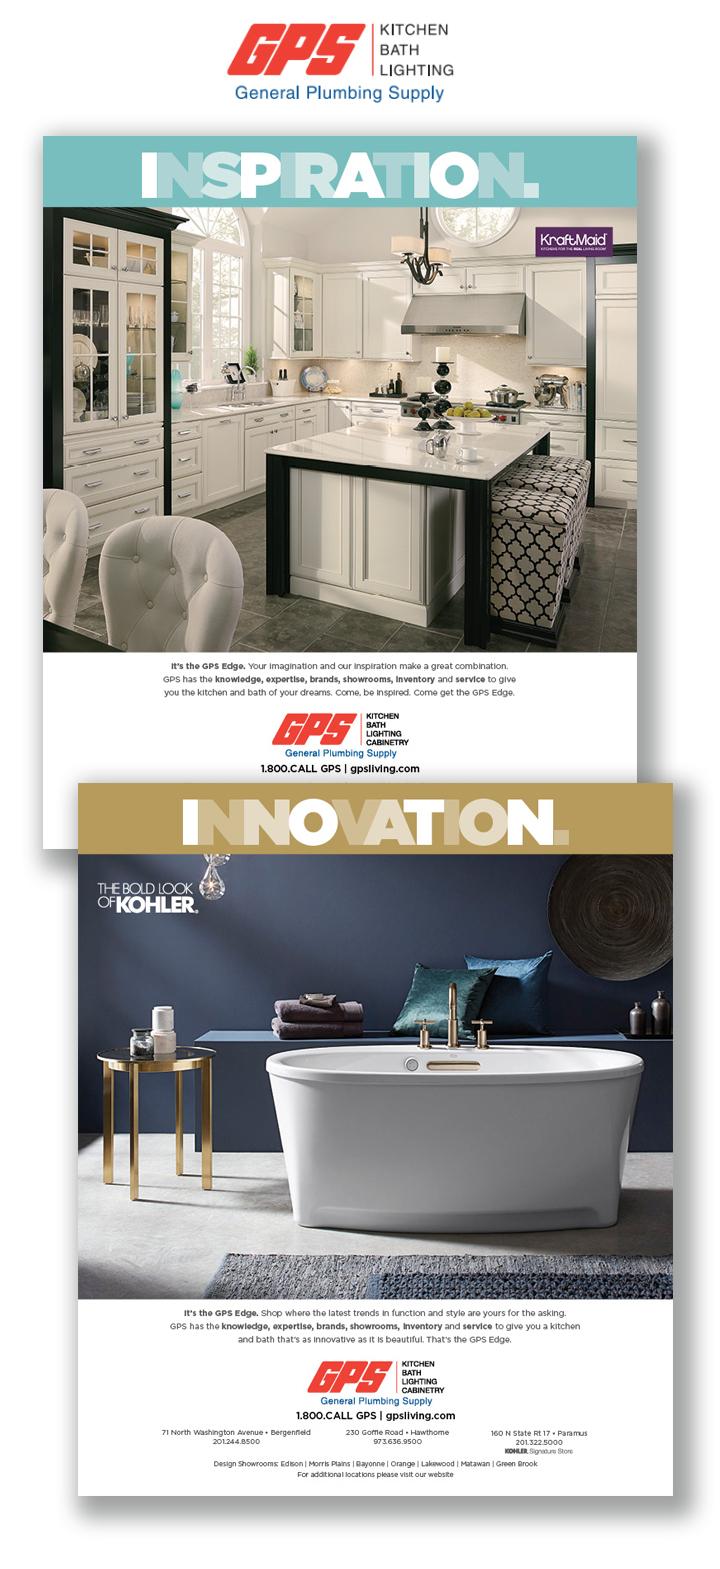 Business to Consumer Marketing Firm NJ -SCG Advertising & PR